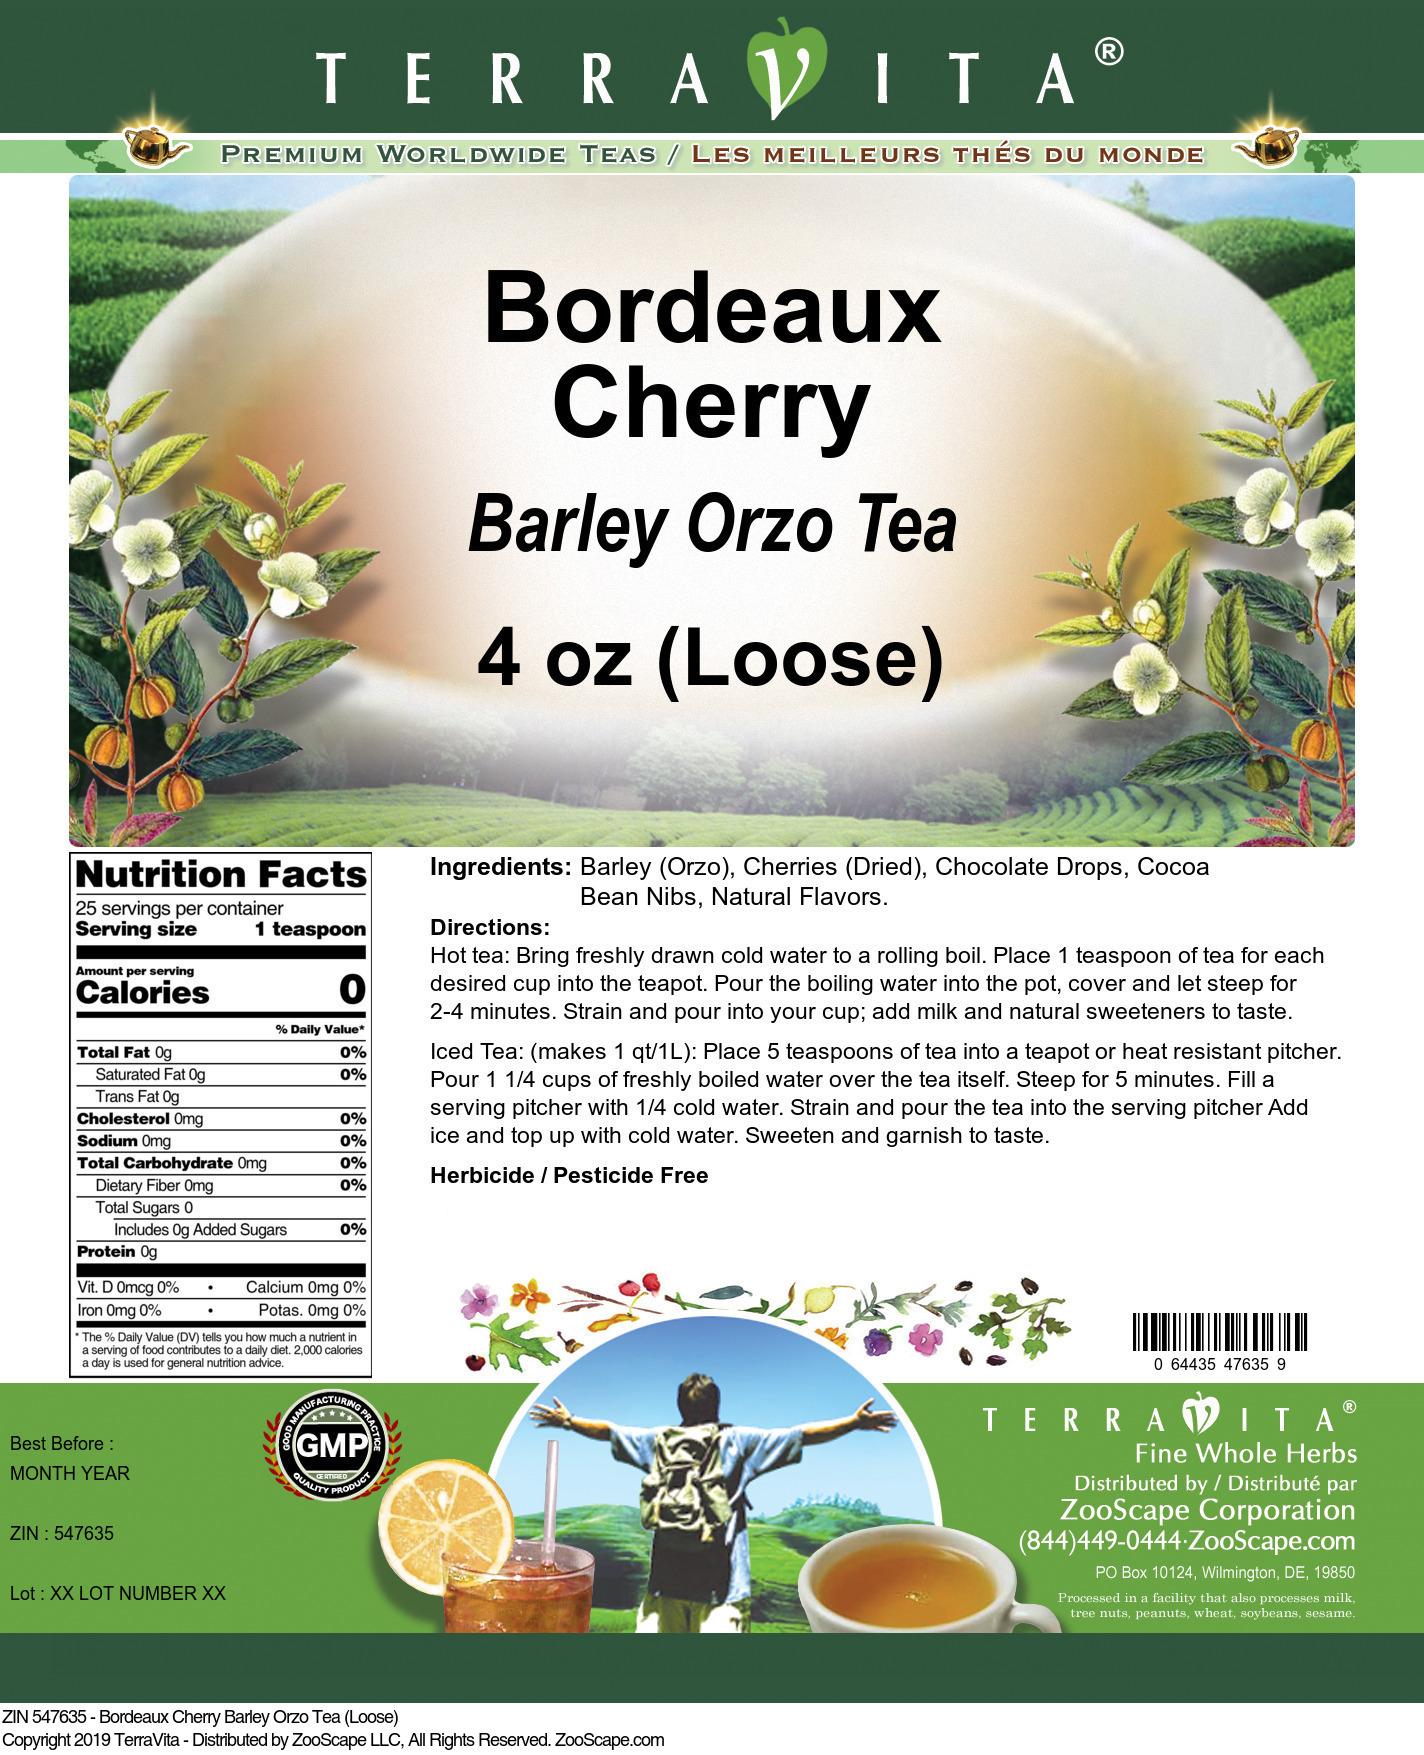 Bordeaux Cherry Barley Orzo